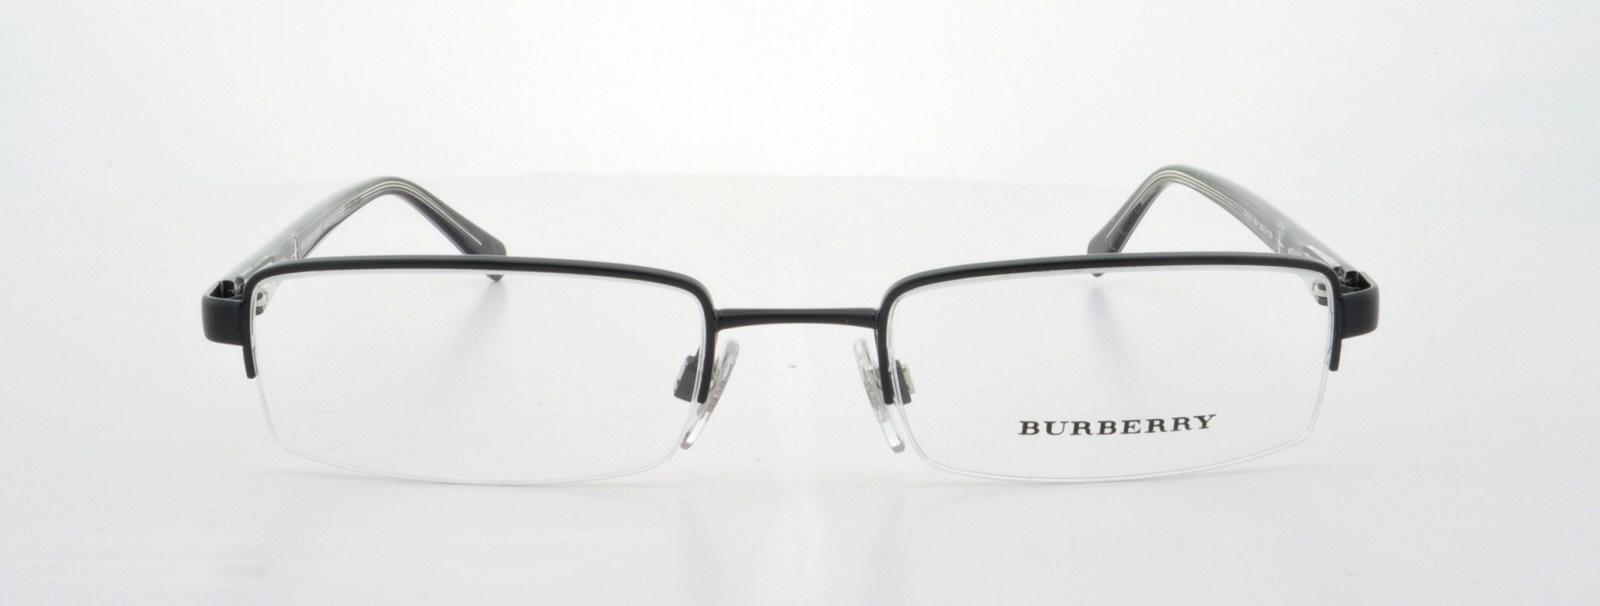 5b49dfc72244 BURBERRY Eyeglasses BE 1012 1001 Black 50MM - Walmart.com